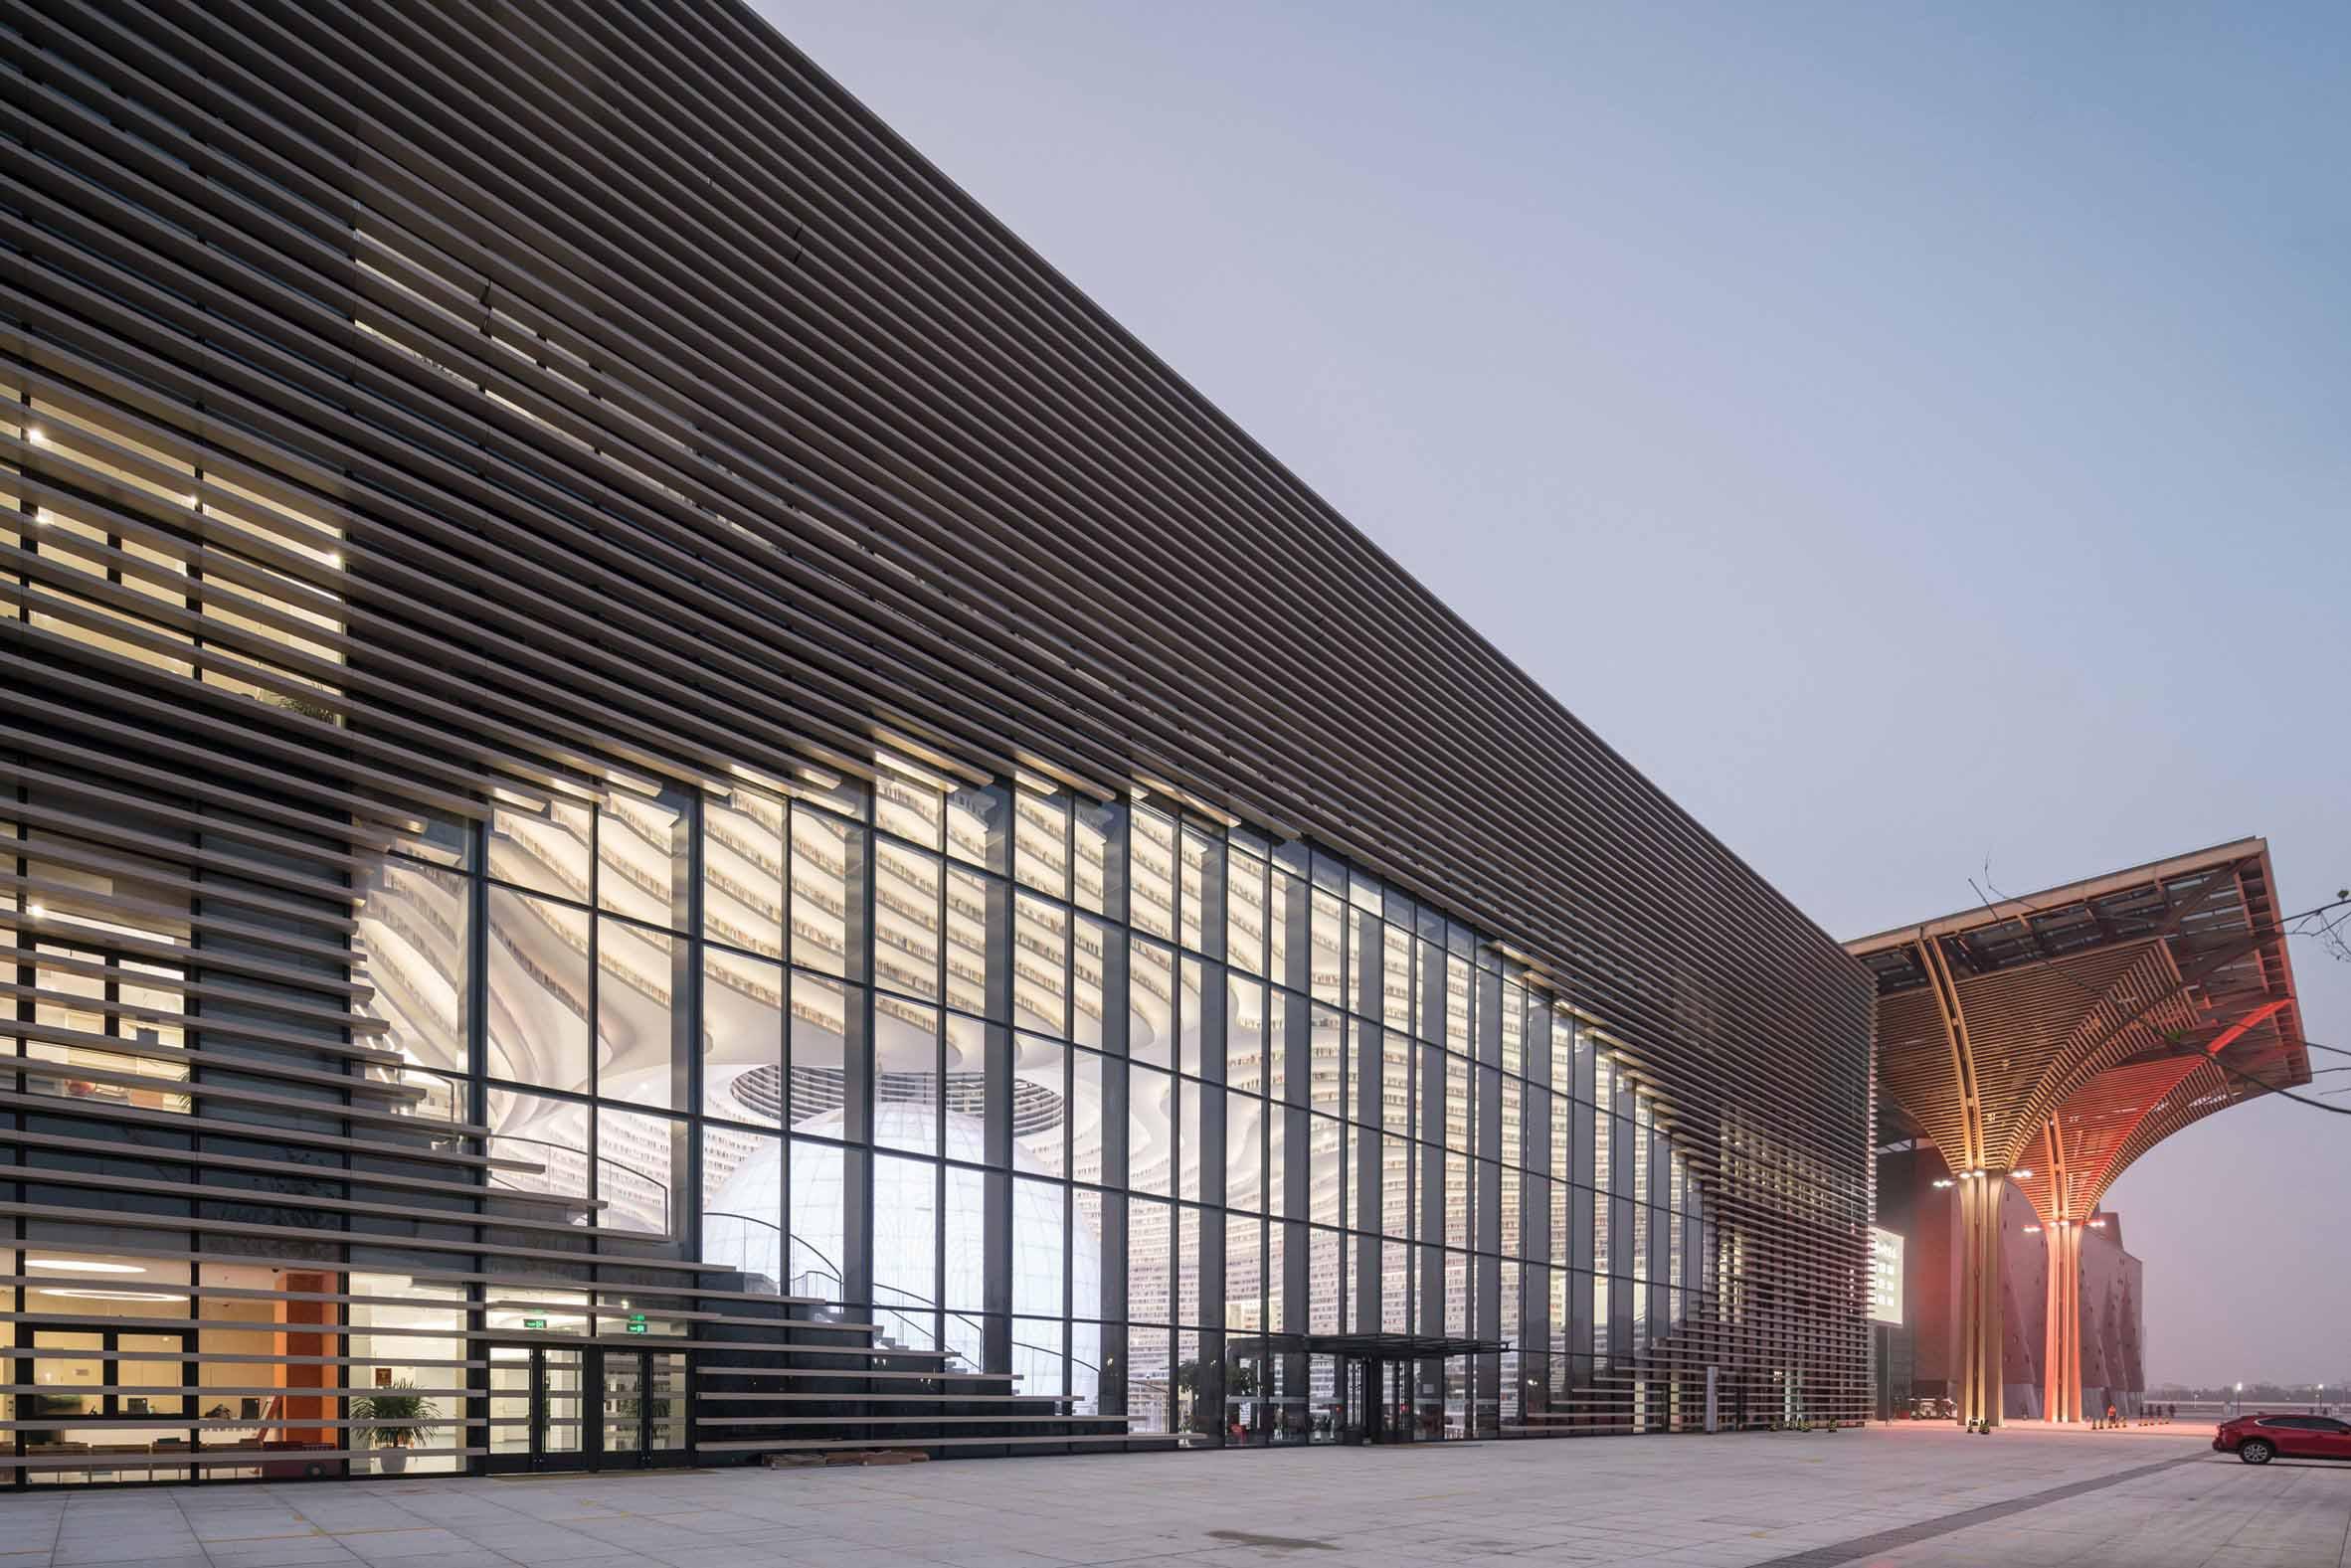 tianjin-binhai-library-mvrdv-architecture-public-and-leisure-china_dezeen_2364_col_16